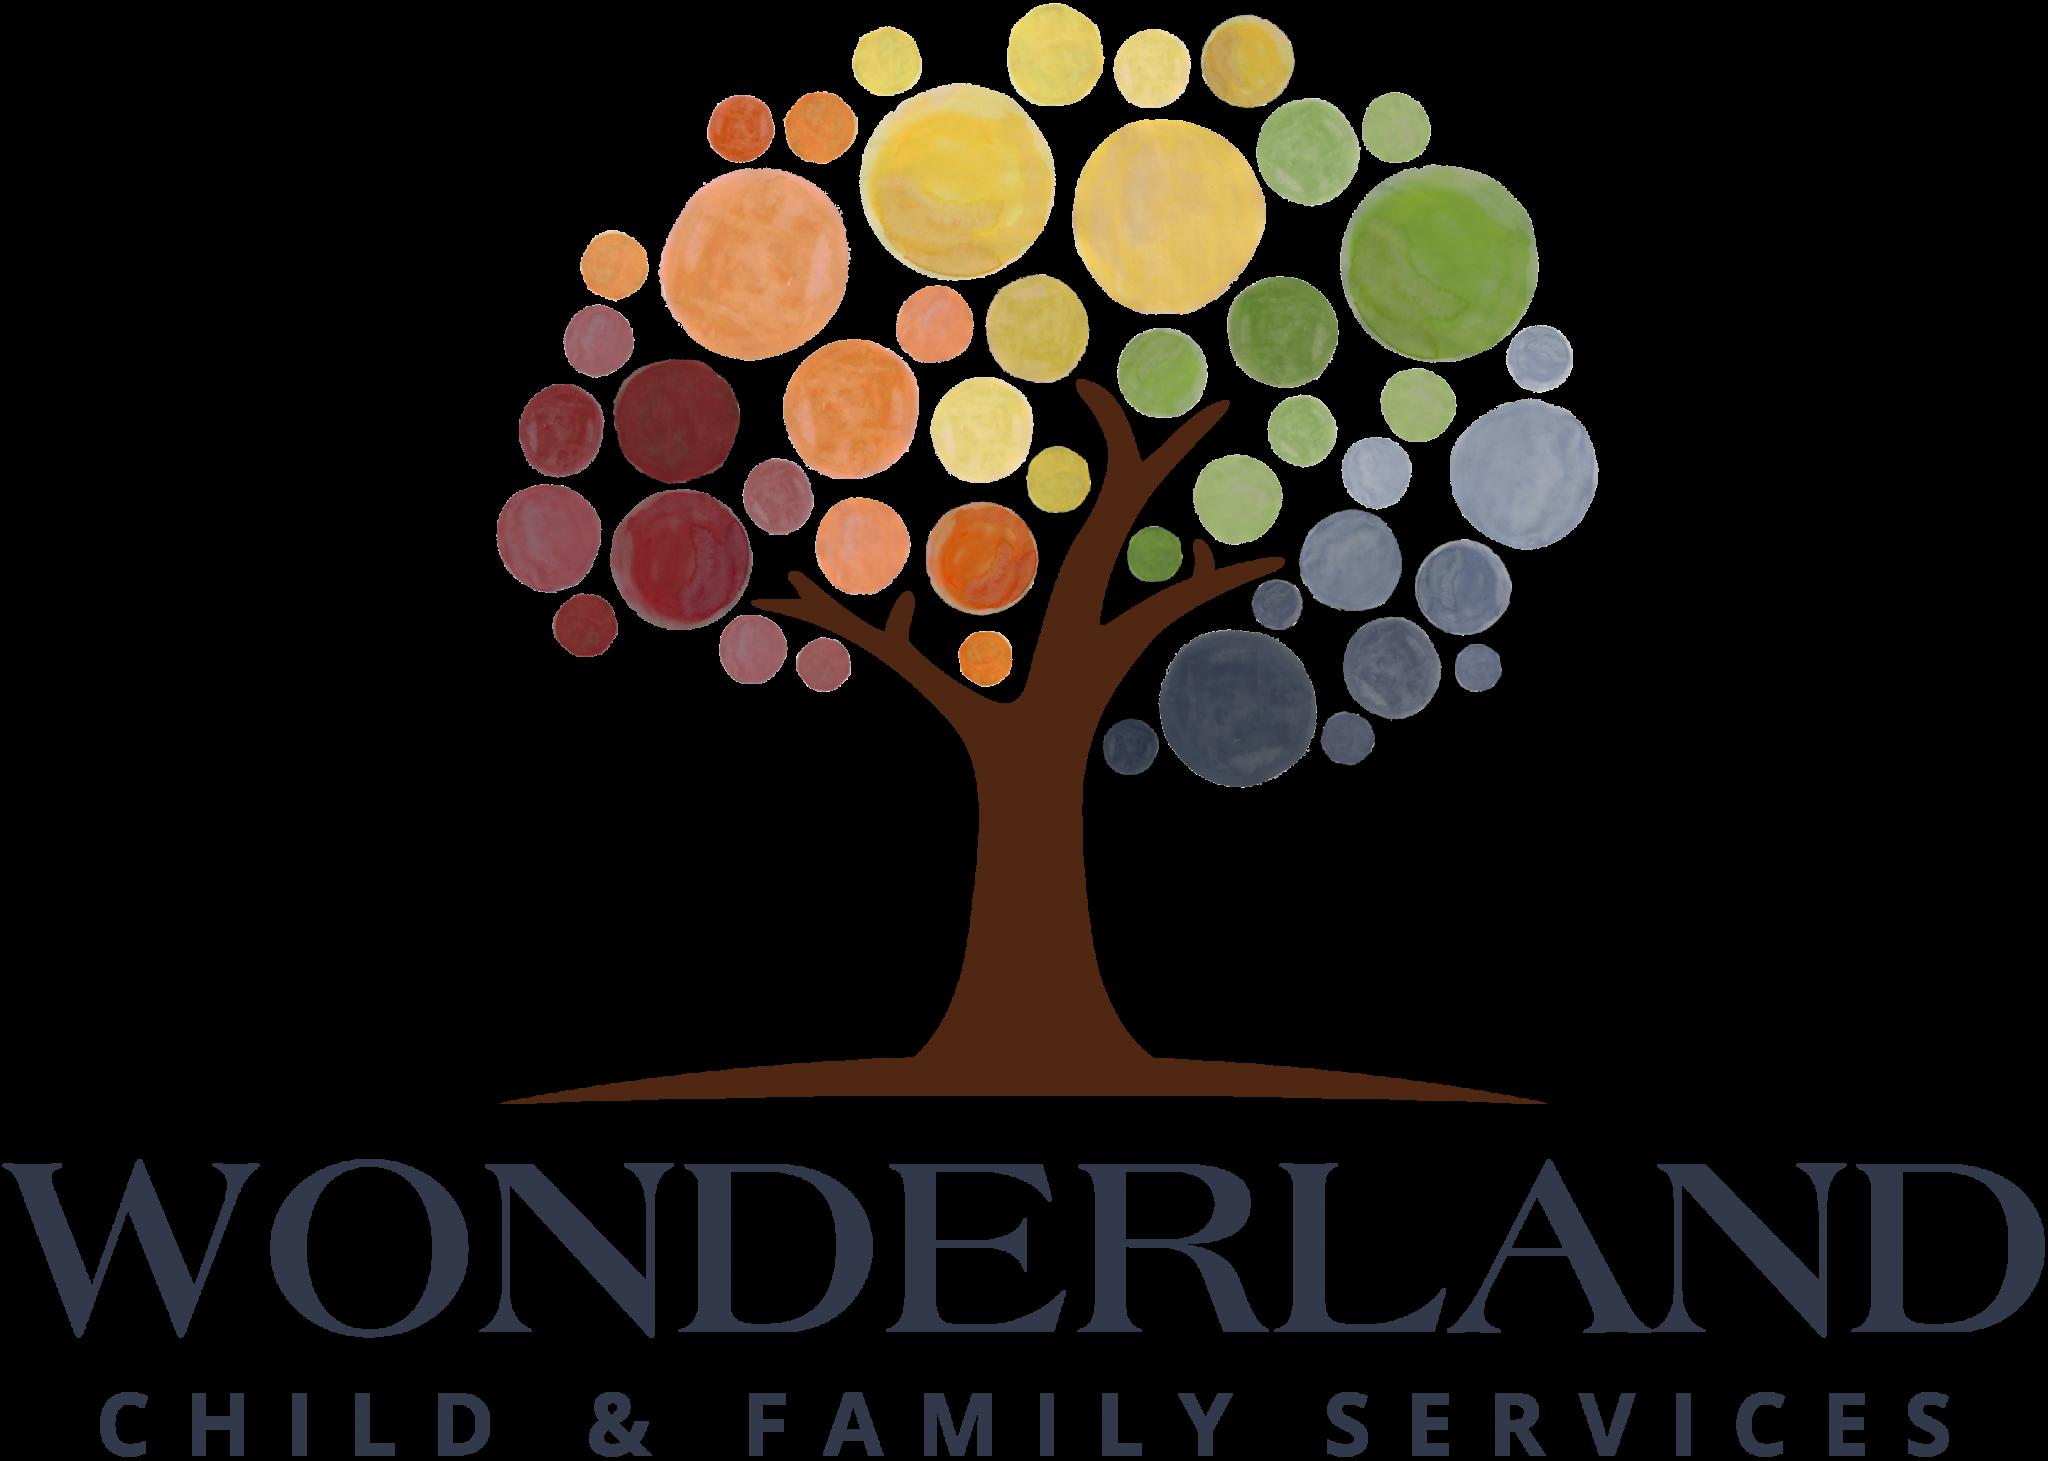 Wonderland Child & Family Services Logo